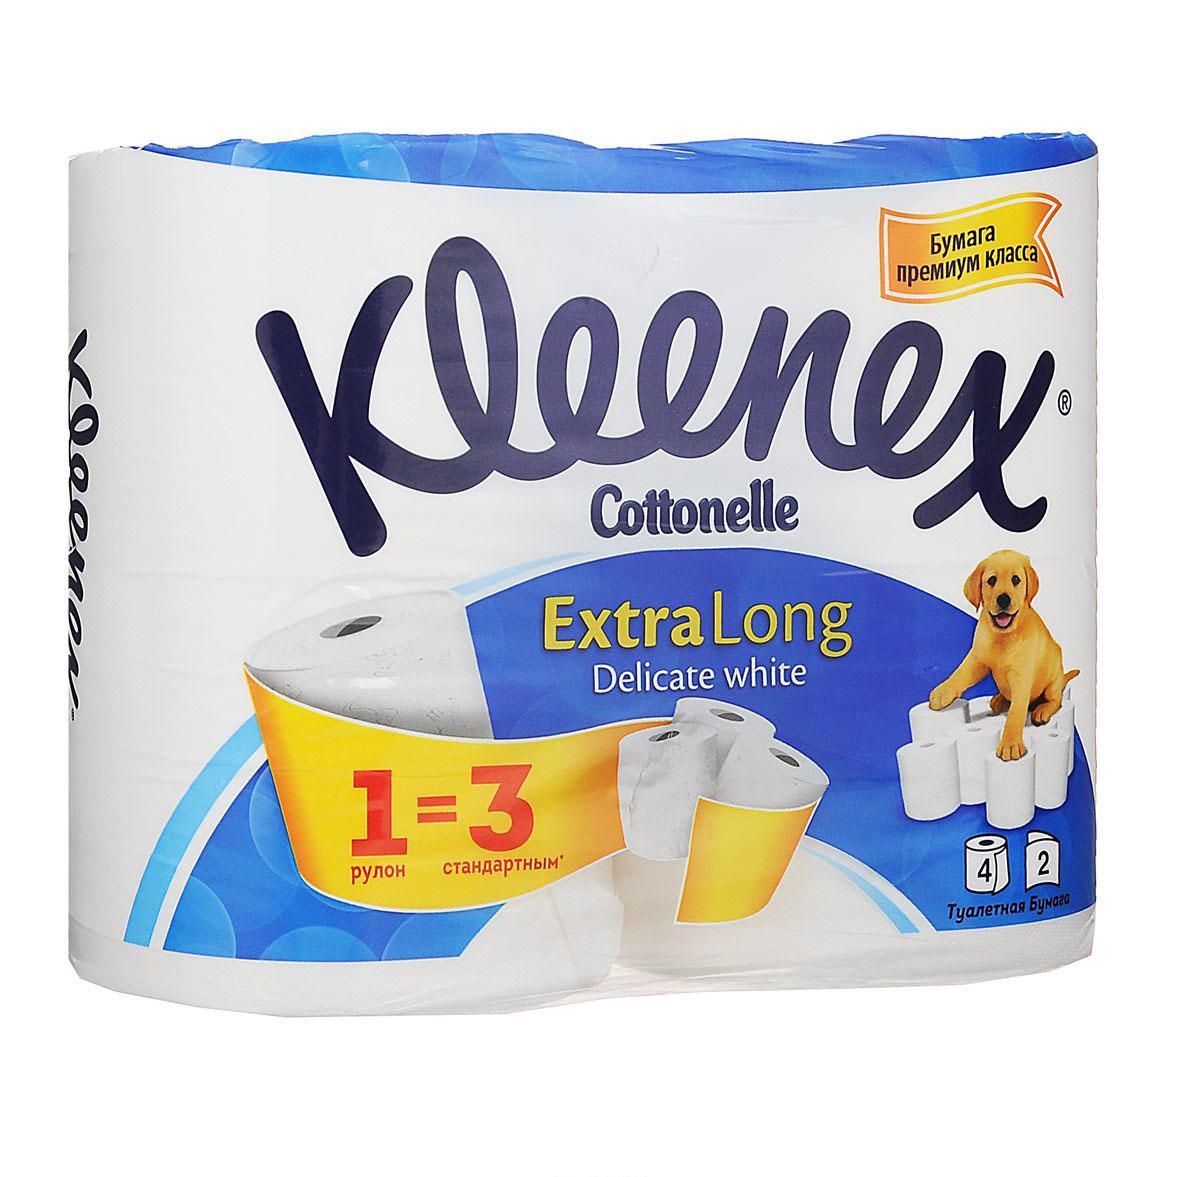 Kleenex Cottonelle Туалетная бумага Extra Long, двухслойная, цвет: белый, 4 рулона kleenex салфетки